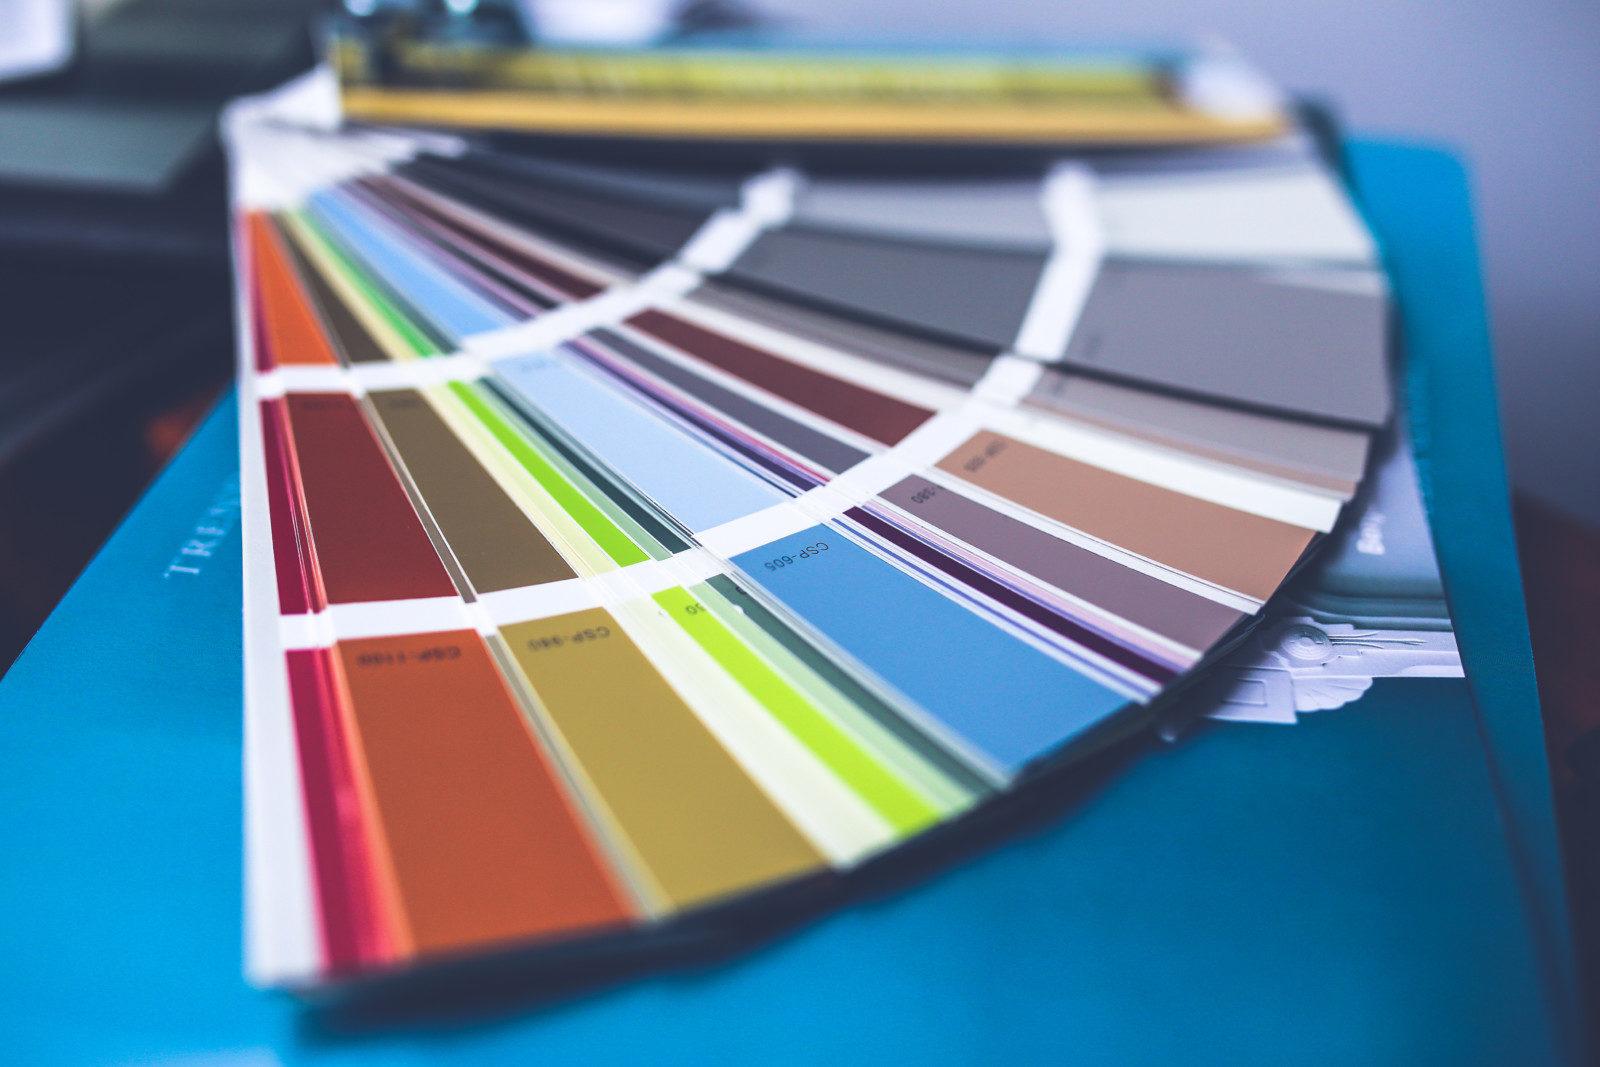 Colour (design) swatches